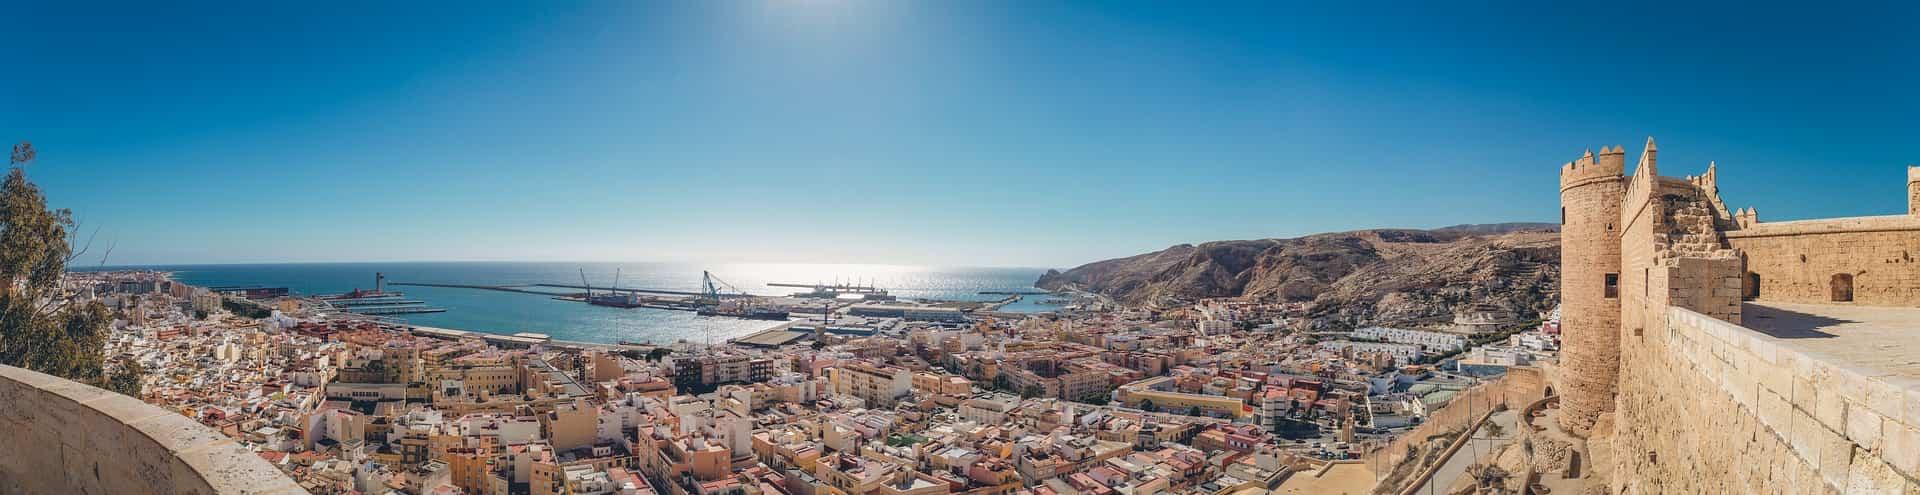 Descubre las mejores ciudades españolas para ir de tapas 8